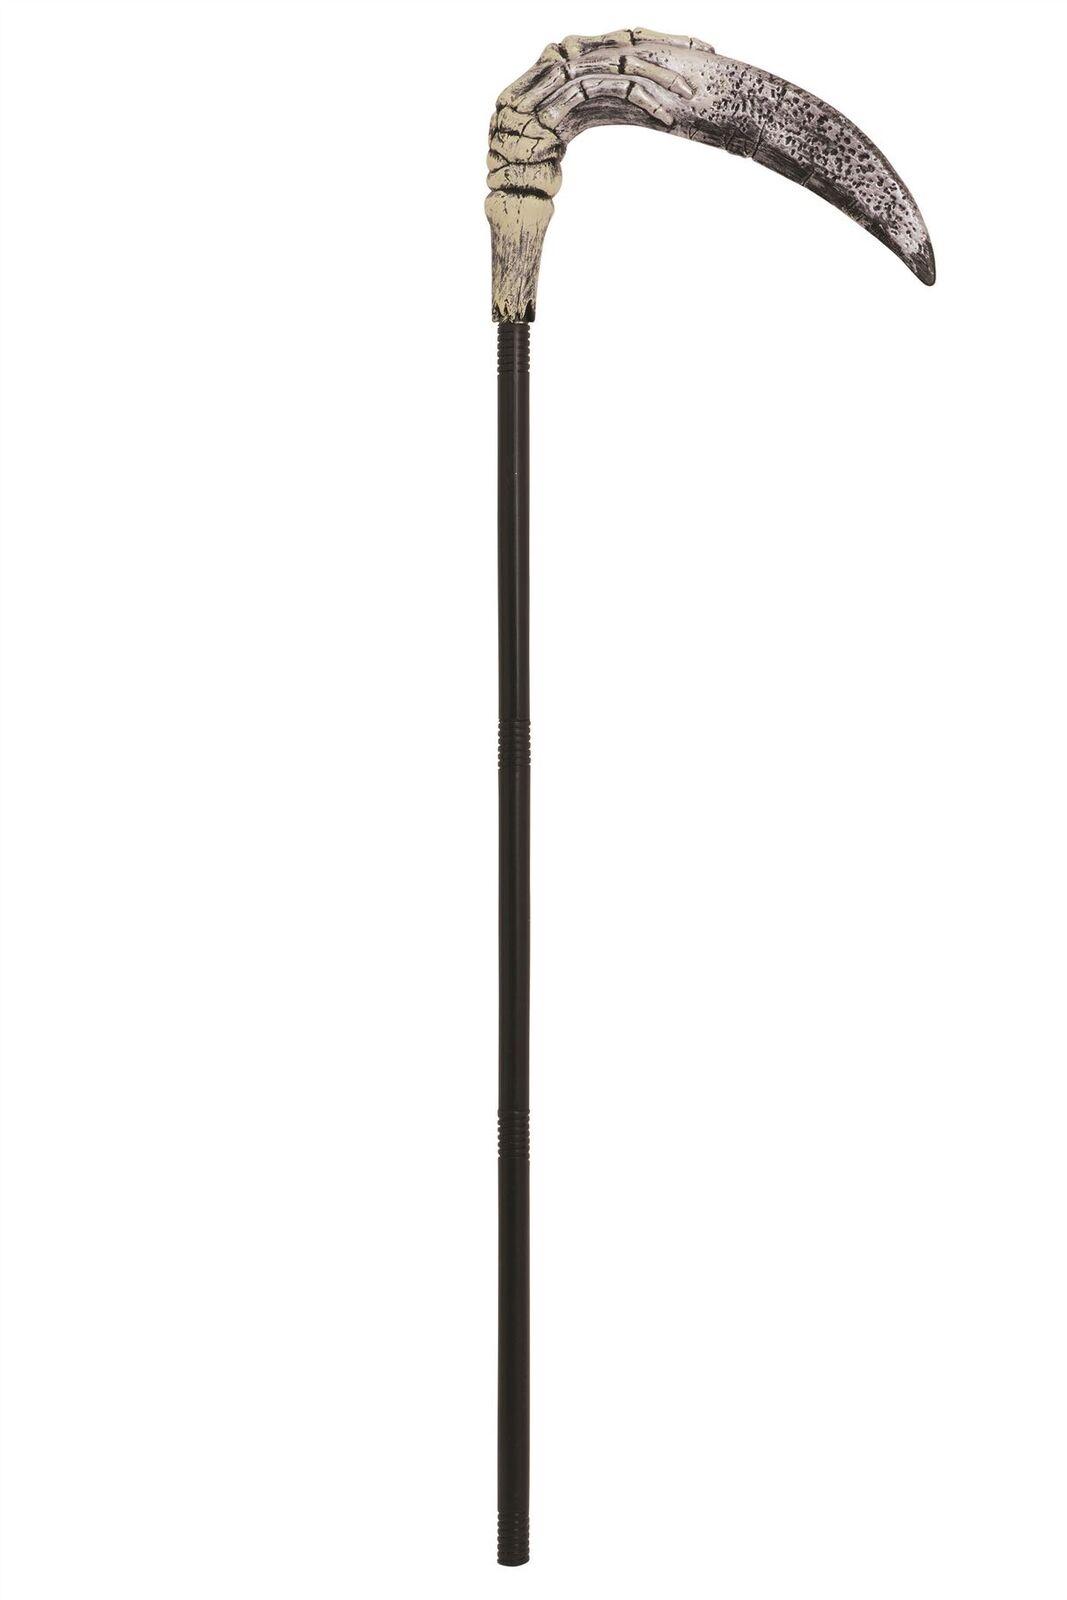 Scythe Grim Reaper 117cm (3 Section), Accessory, Halloween, Fancy Dress